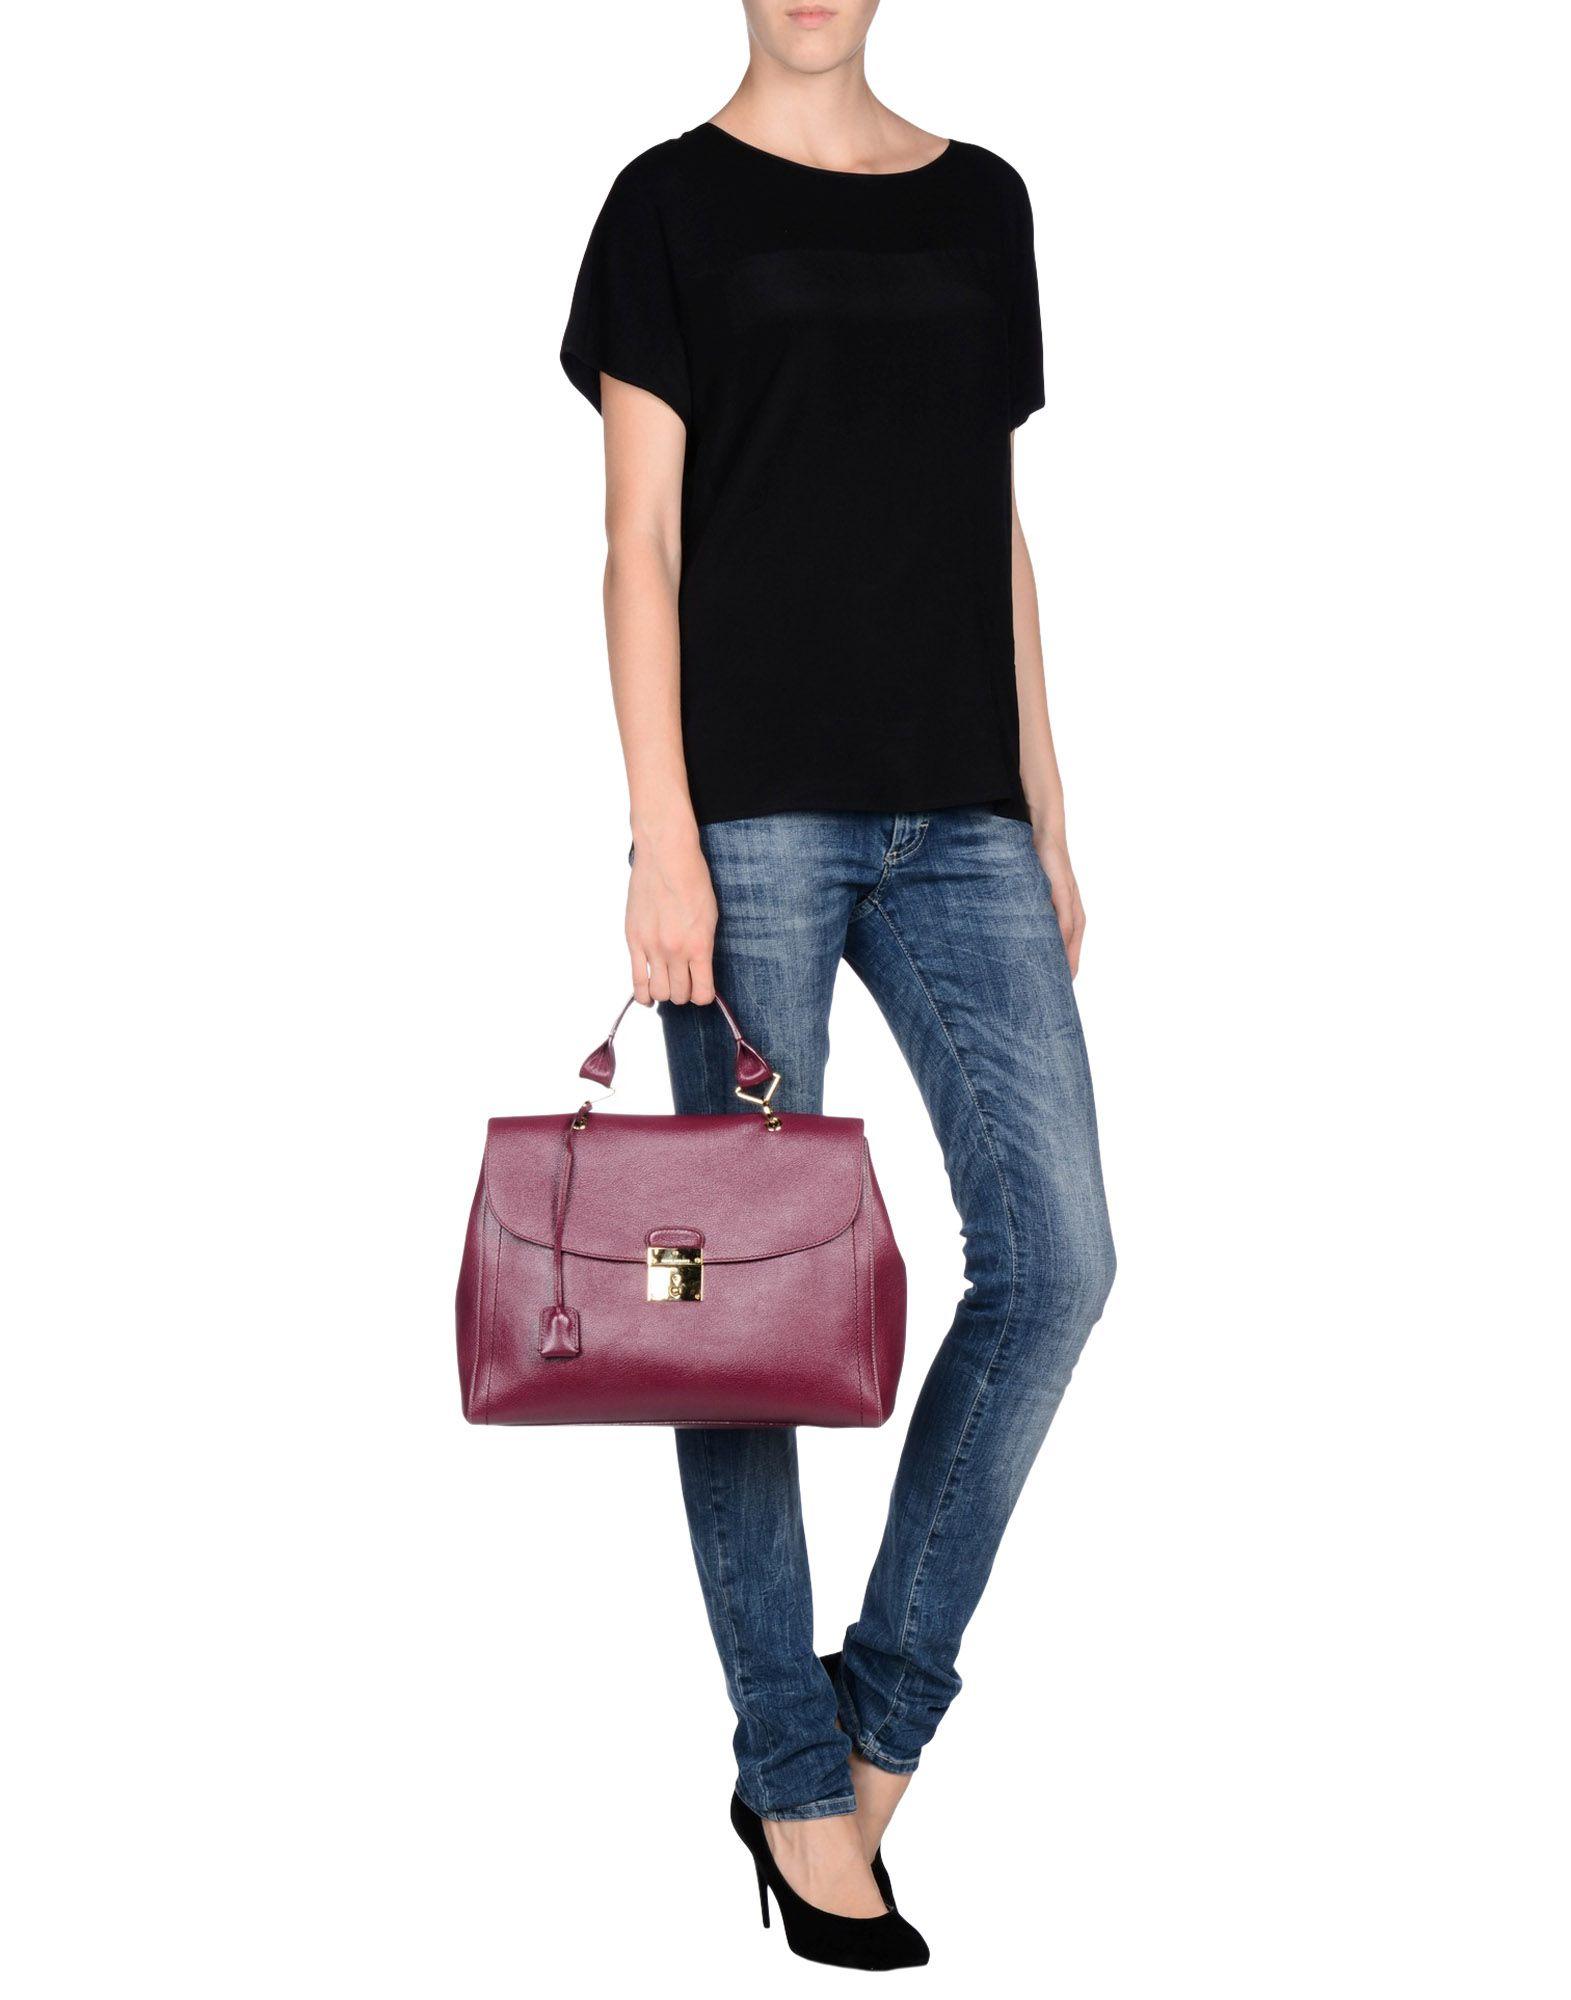 lyst marc jacobs handbag in purple. Black Bedroom Furniture Sets. Home Design Ideas